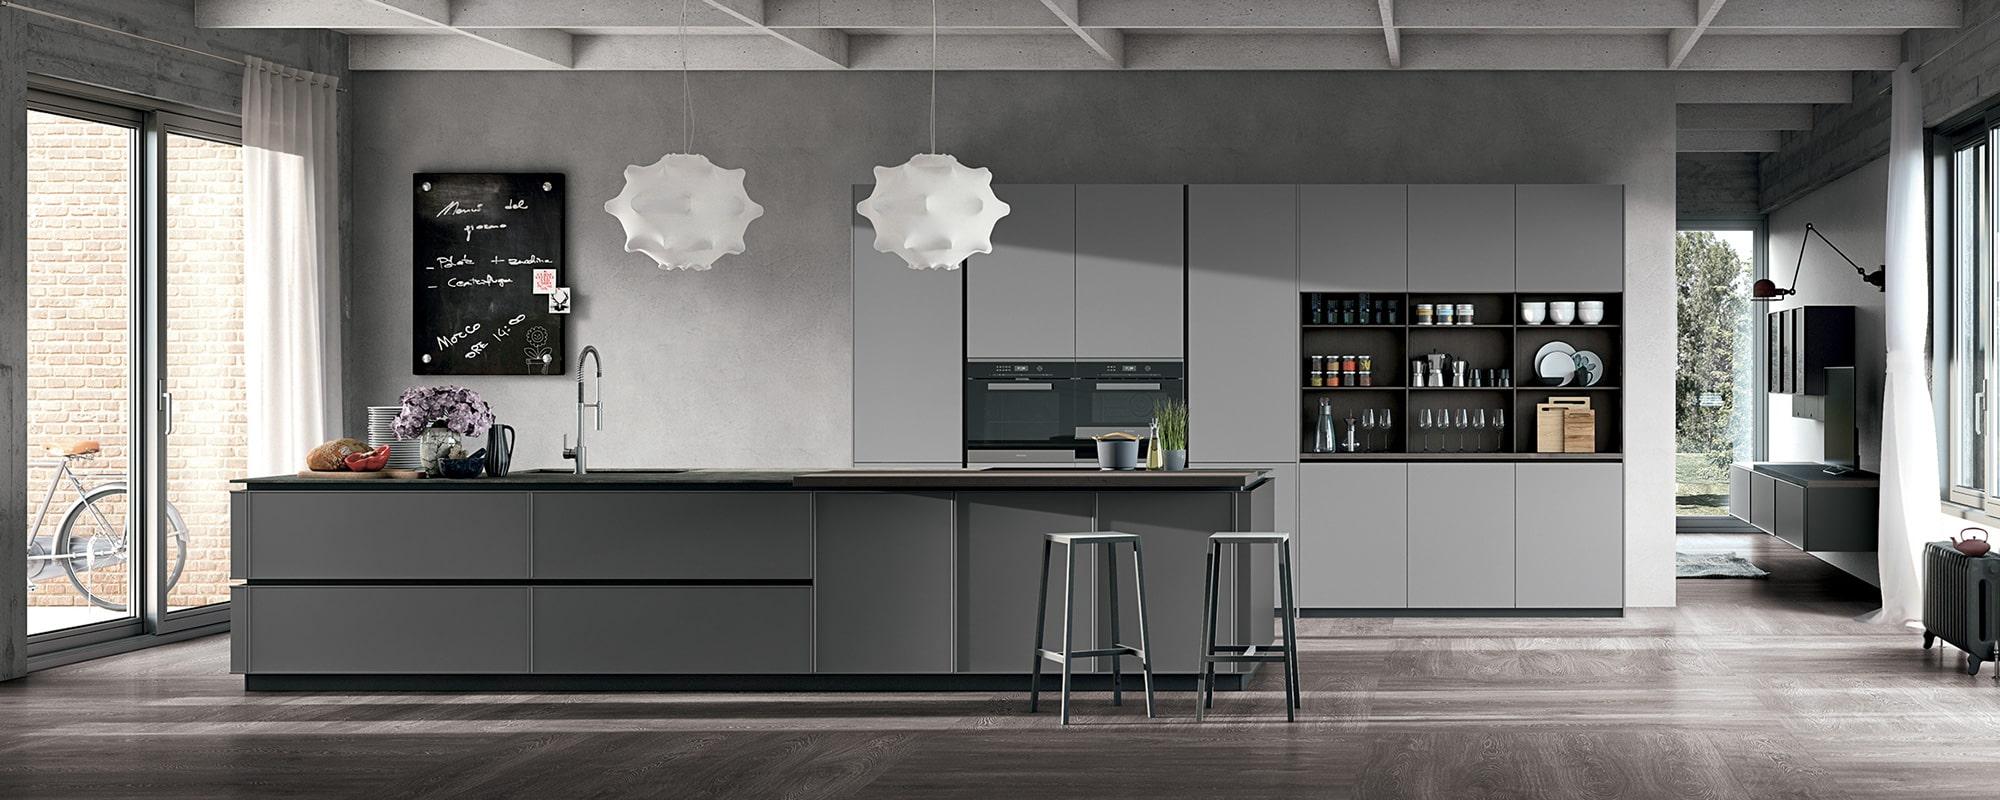 cucina-stosa-frame-stefano-arredamenti-lecce-2